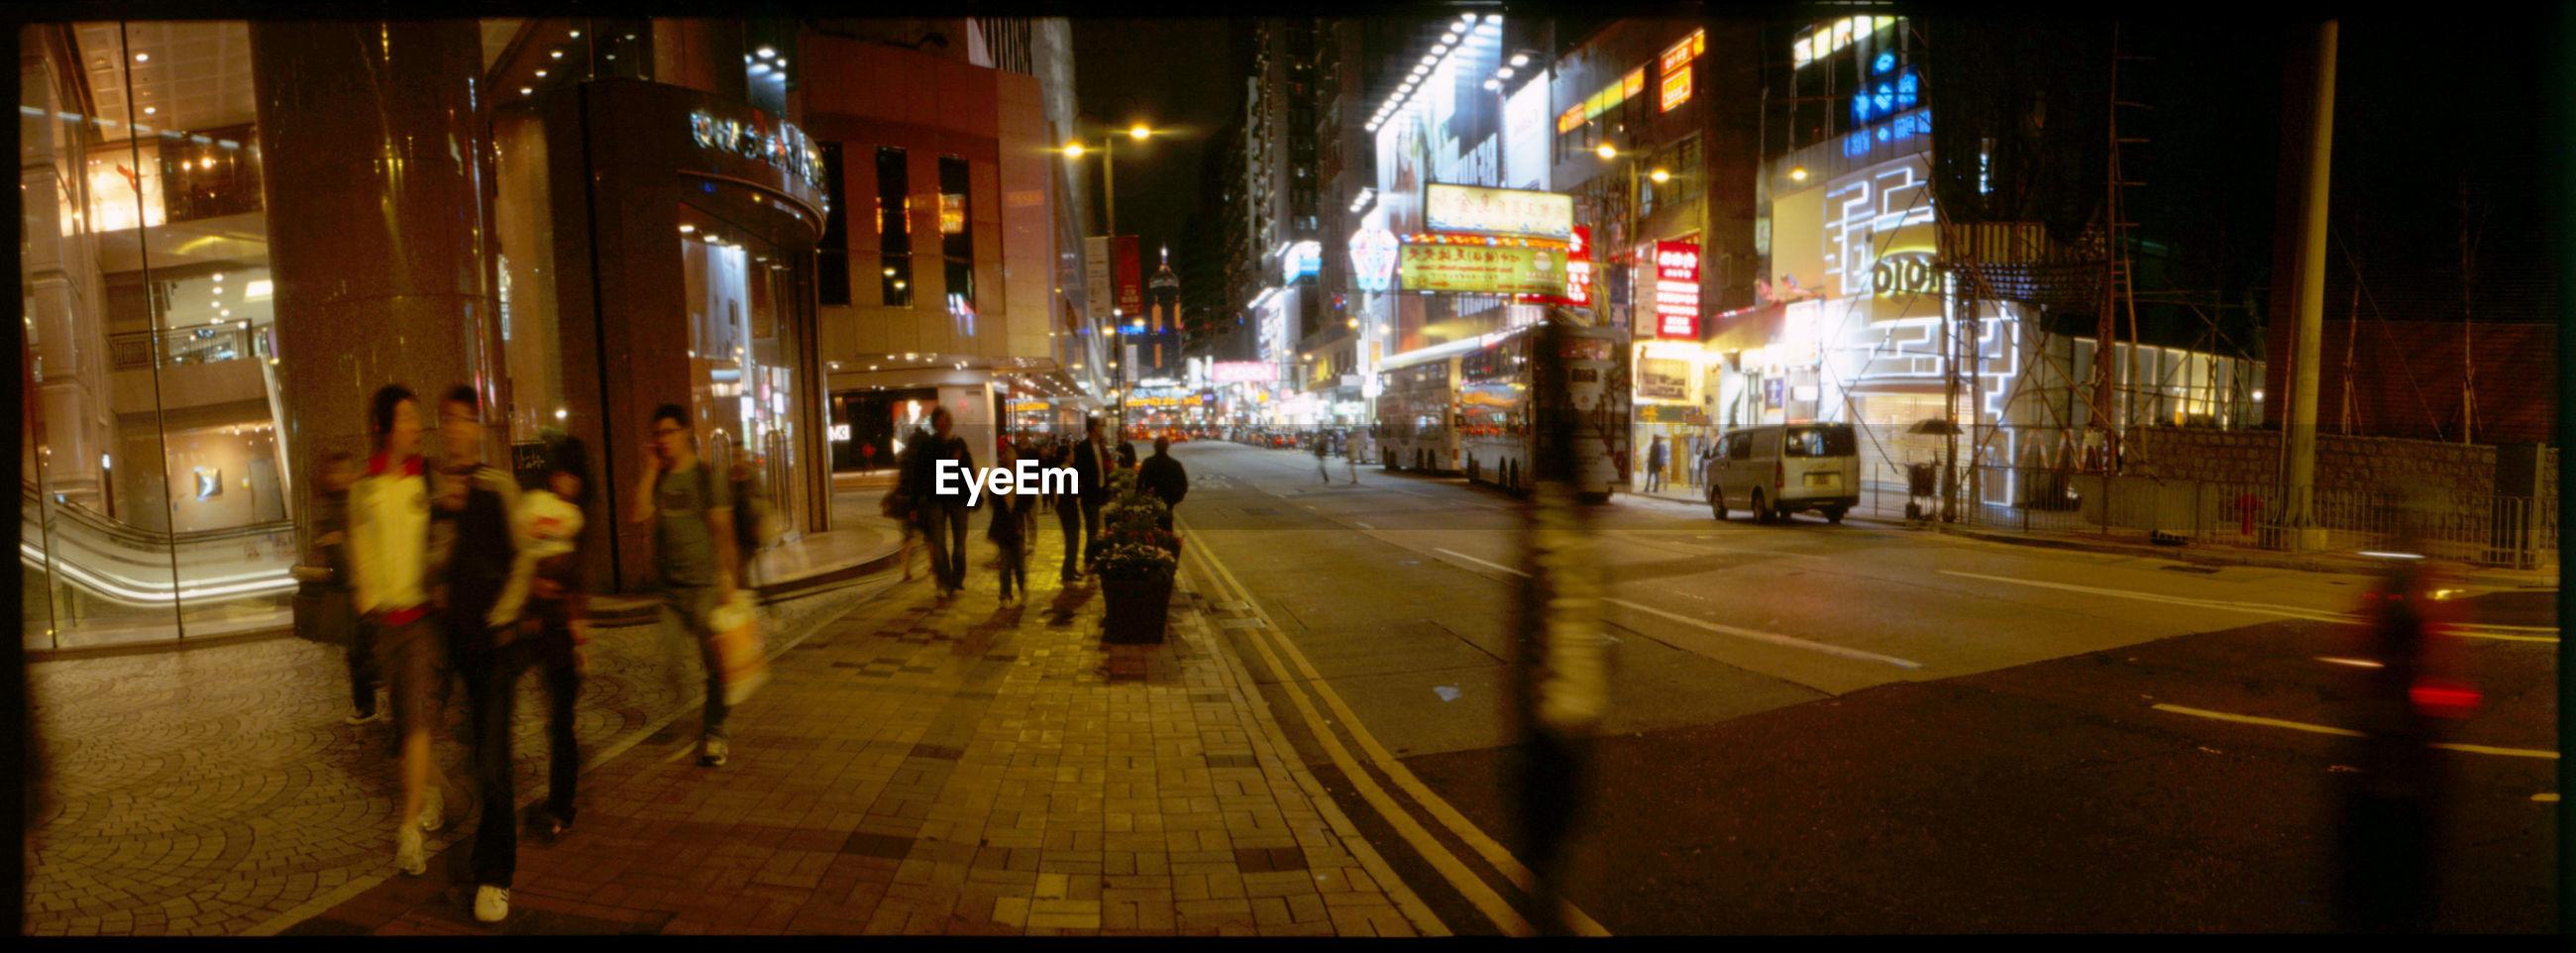 People on sidewalk by city street at night